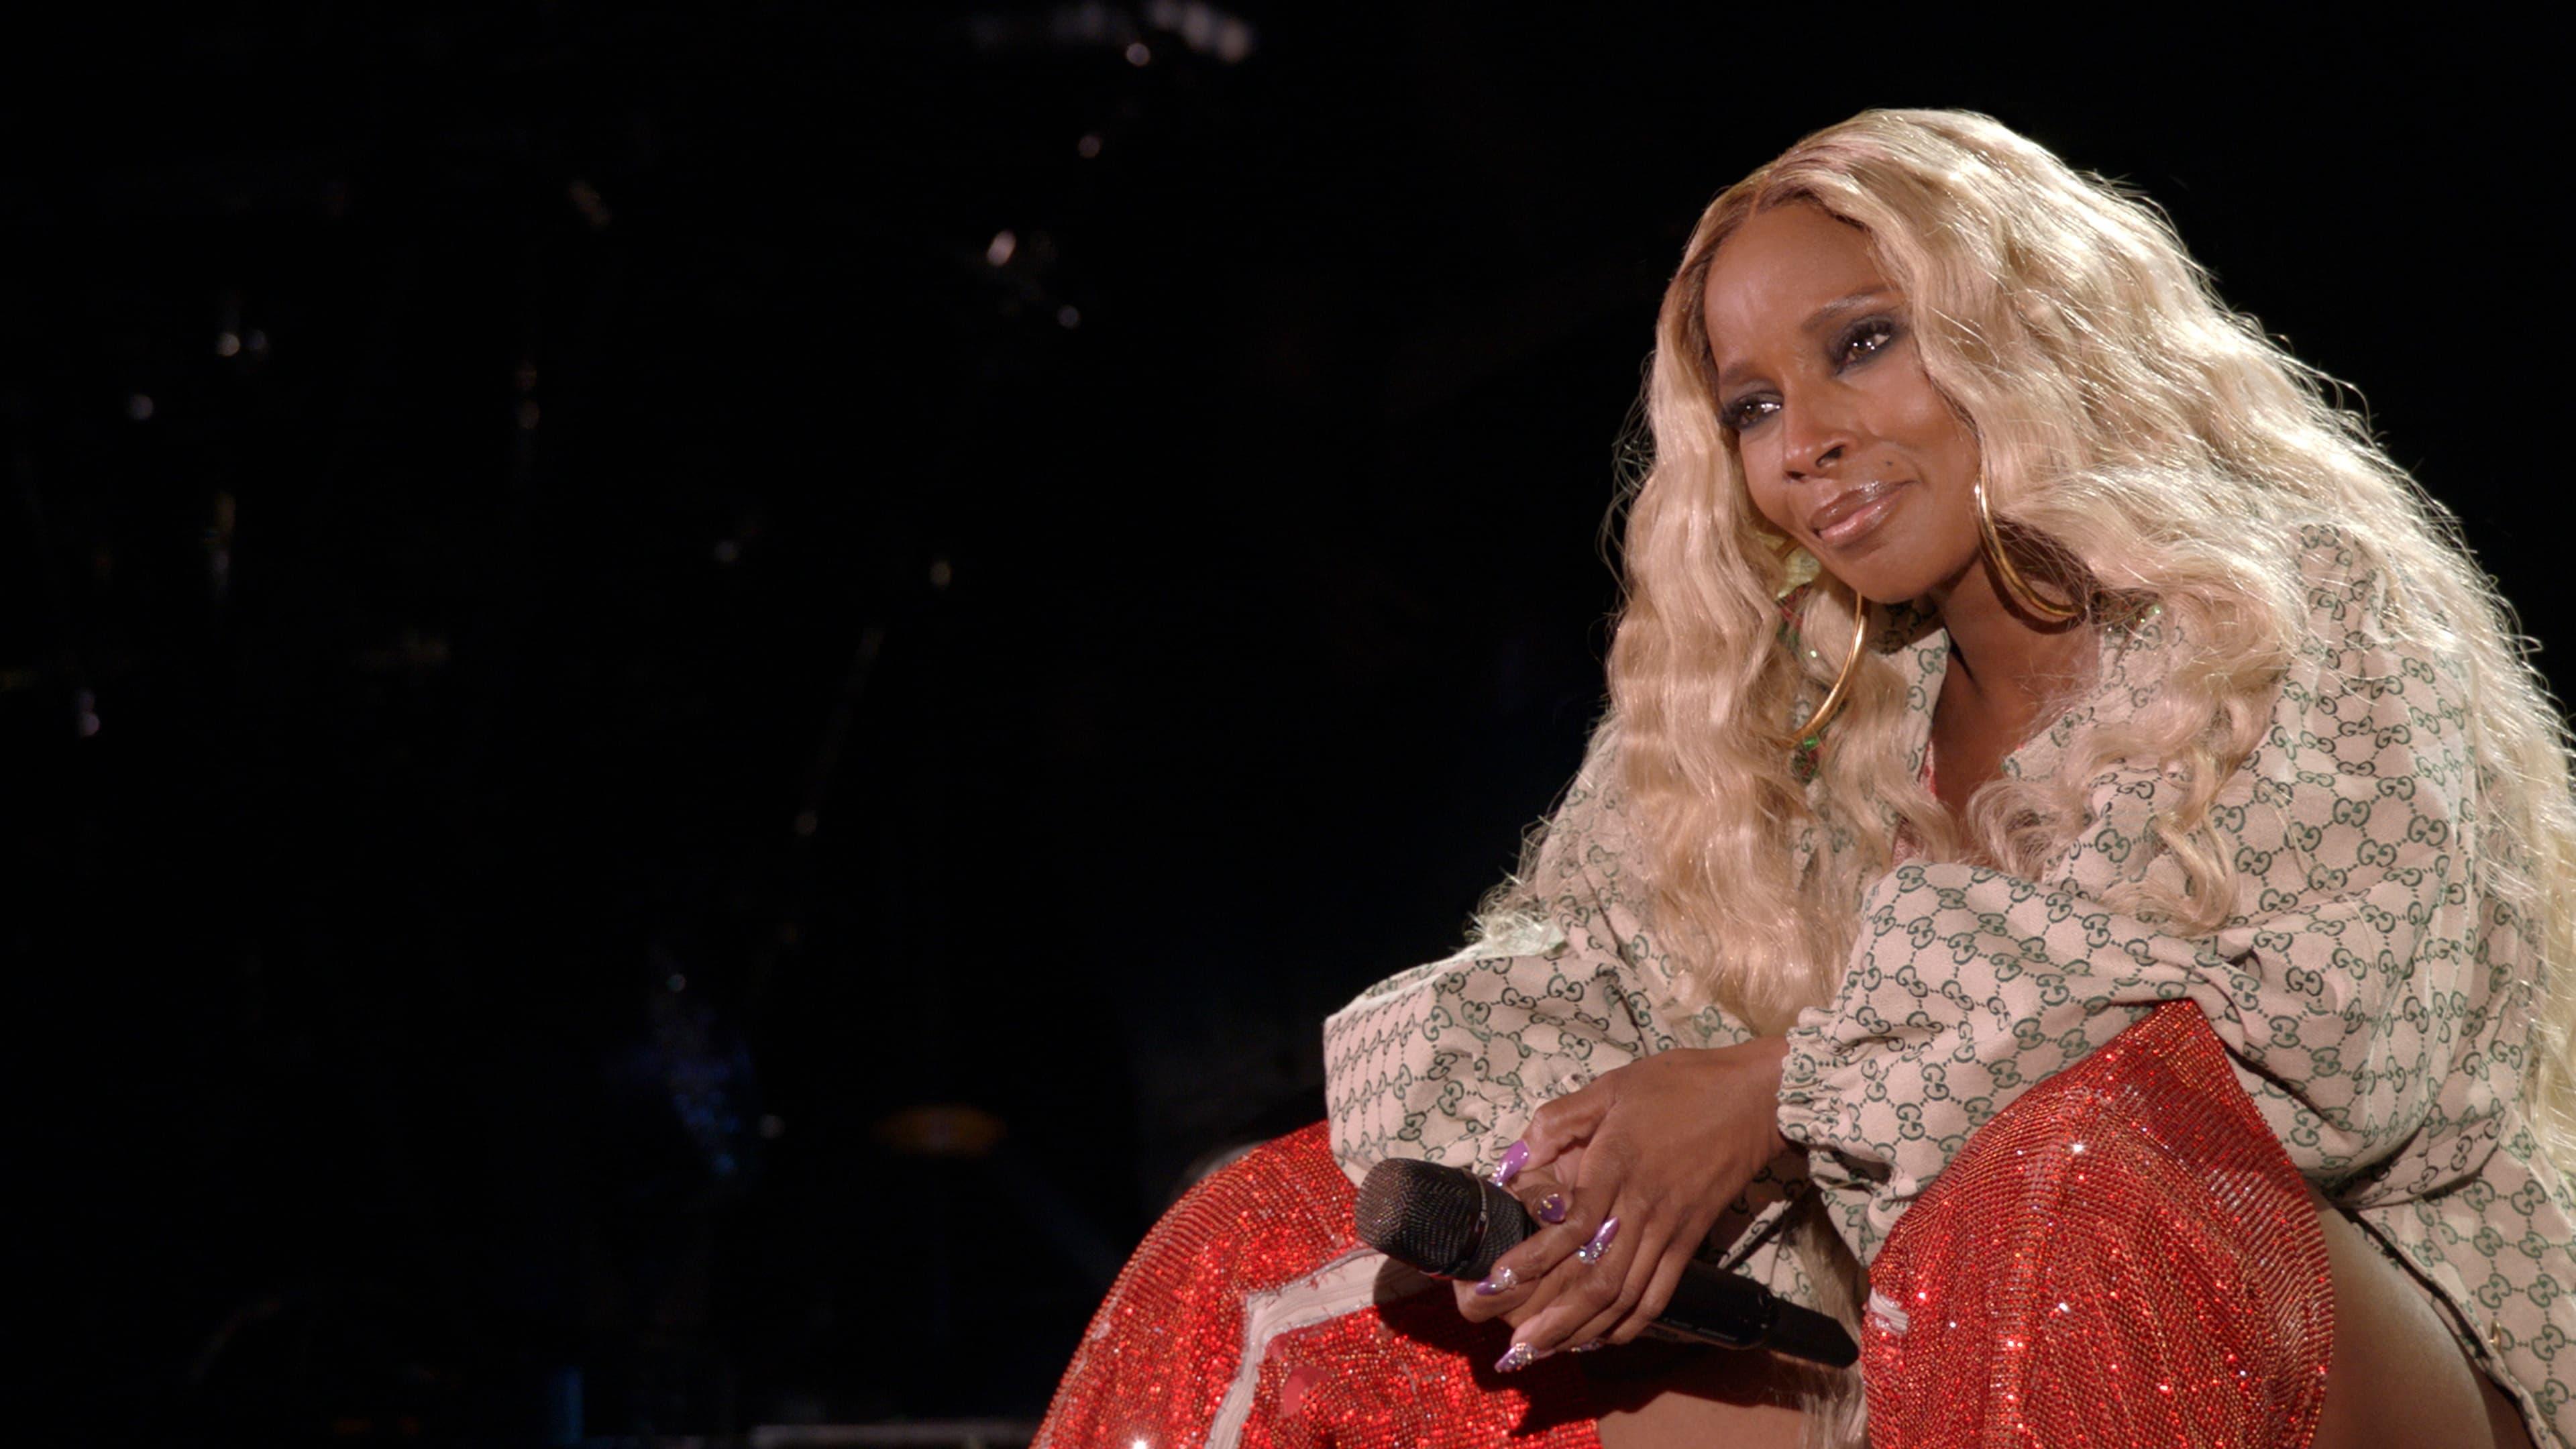 Película Mary J. Blige's My Life en GNULA